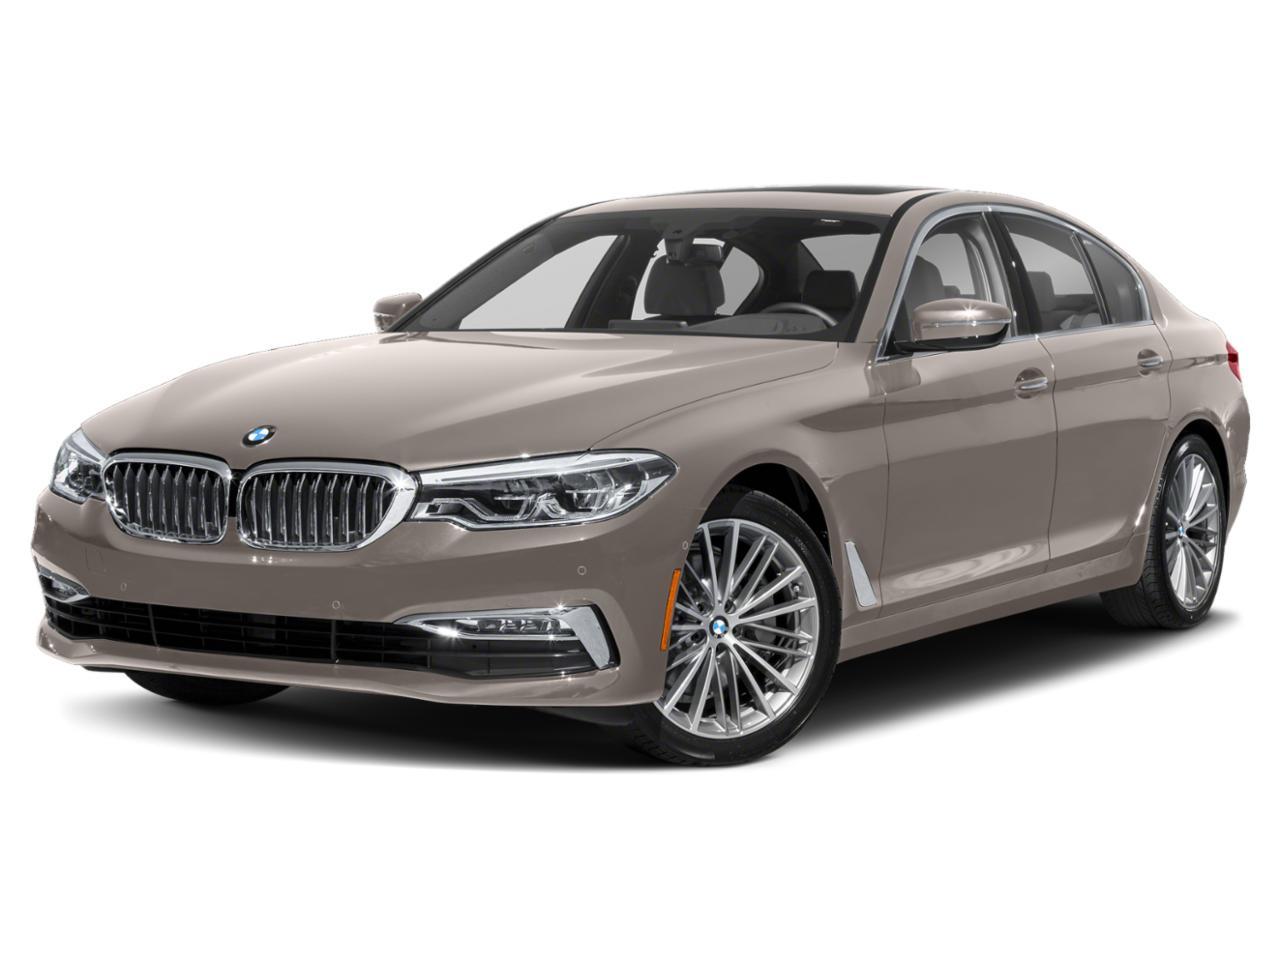 2018 BMW 540i Vehicle Photo in Pleasanton, CA 94588